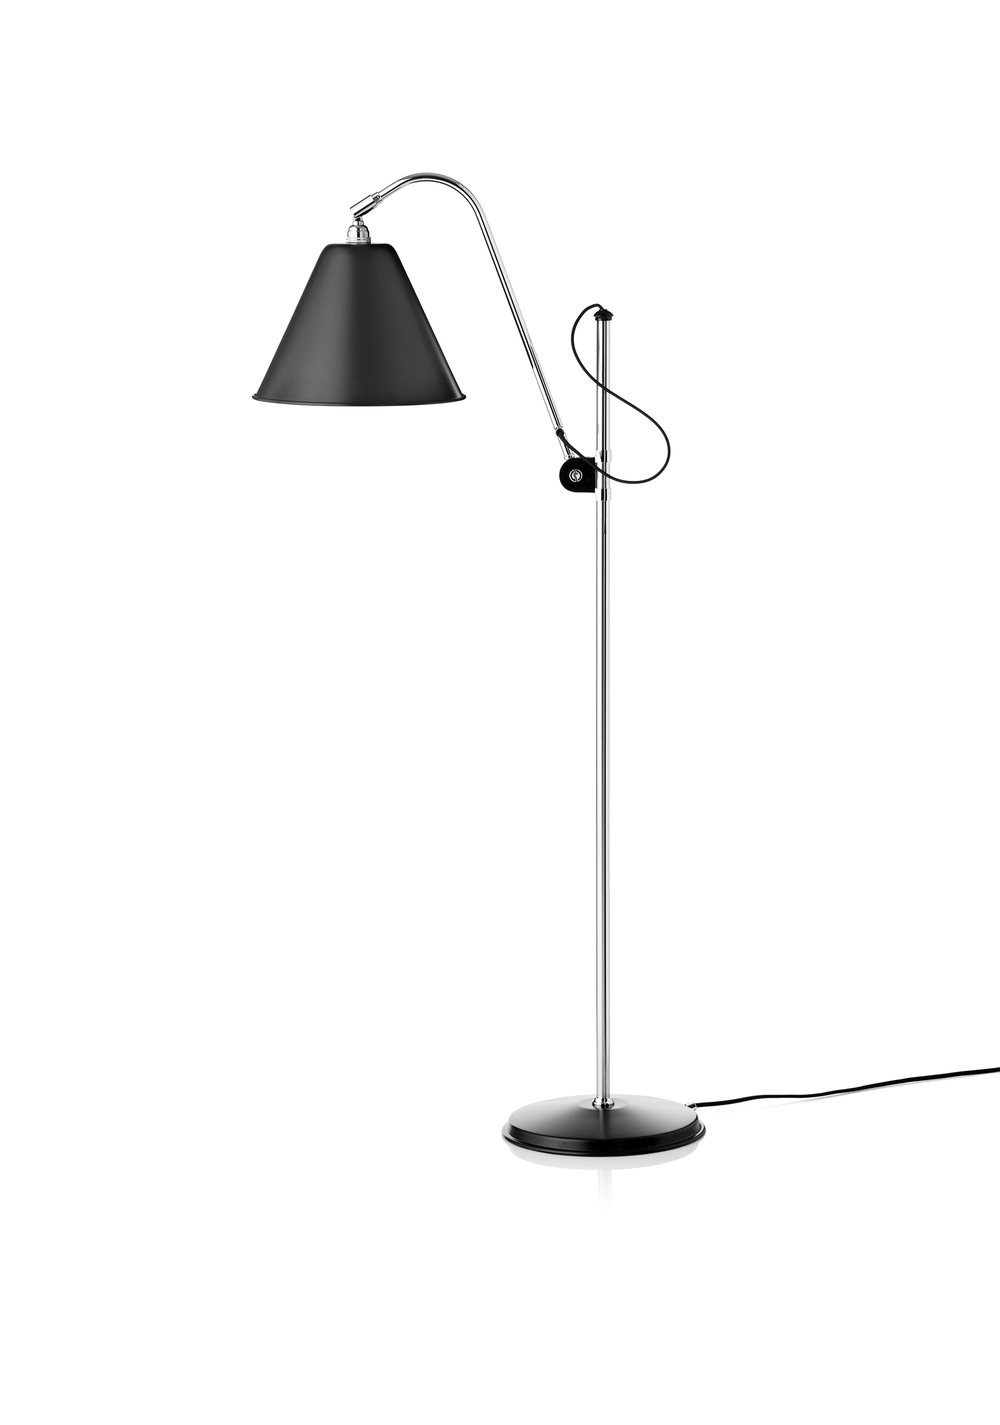 Bestlite Floor Lamp BL3 Original Shade